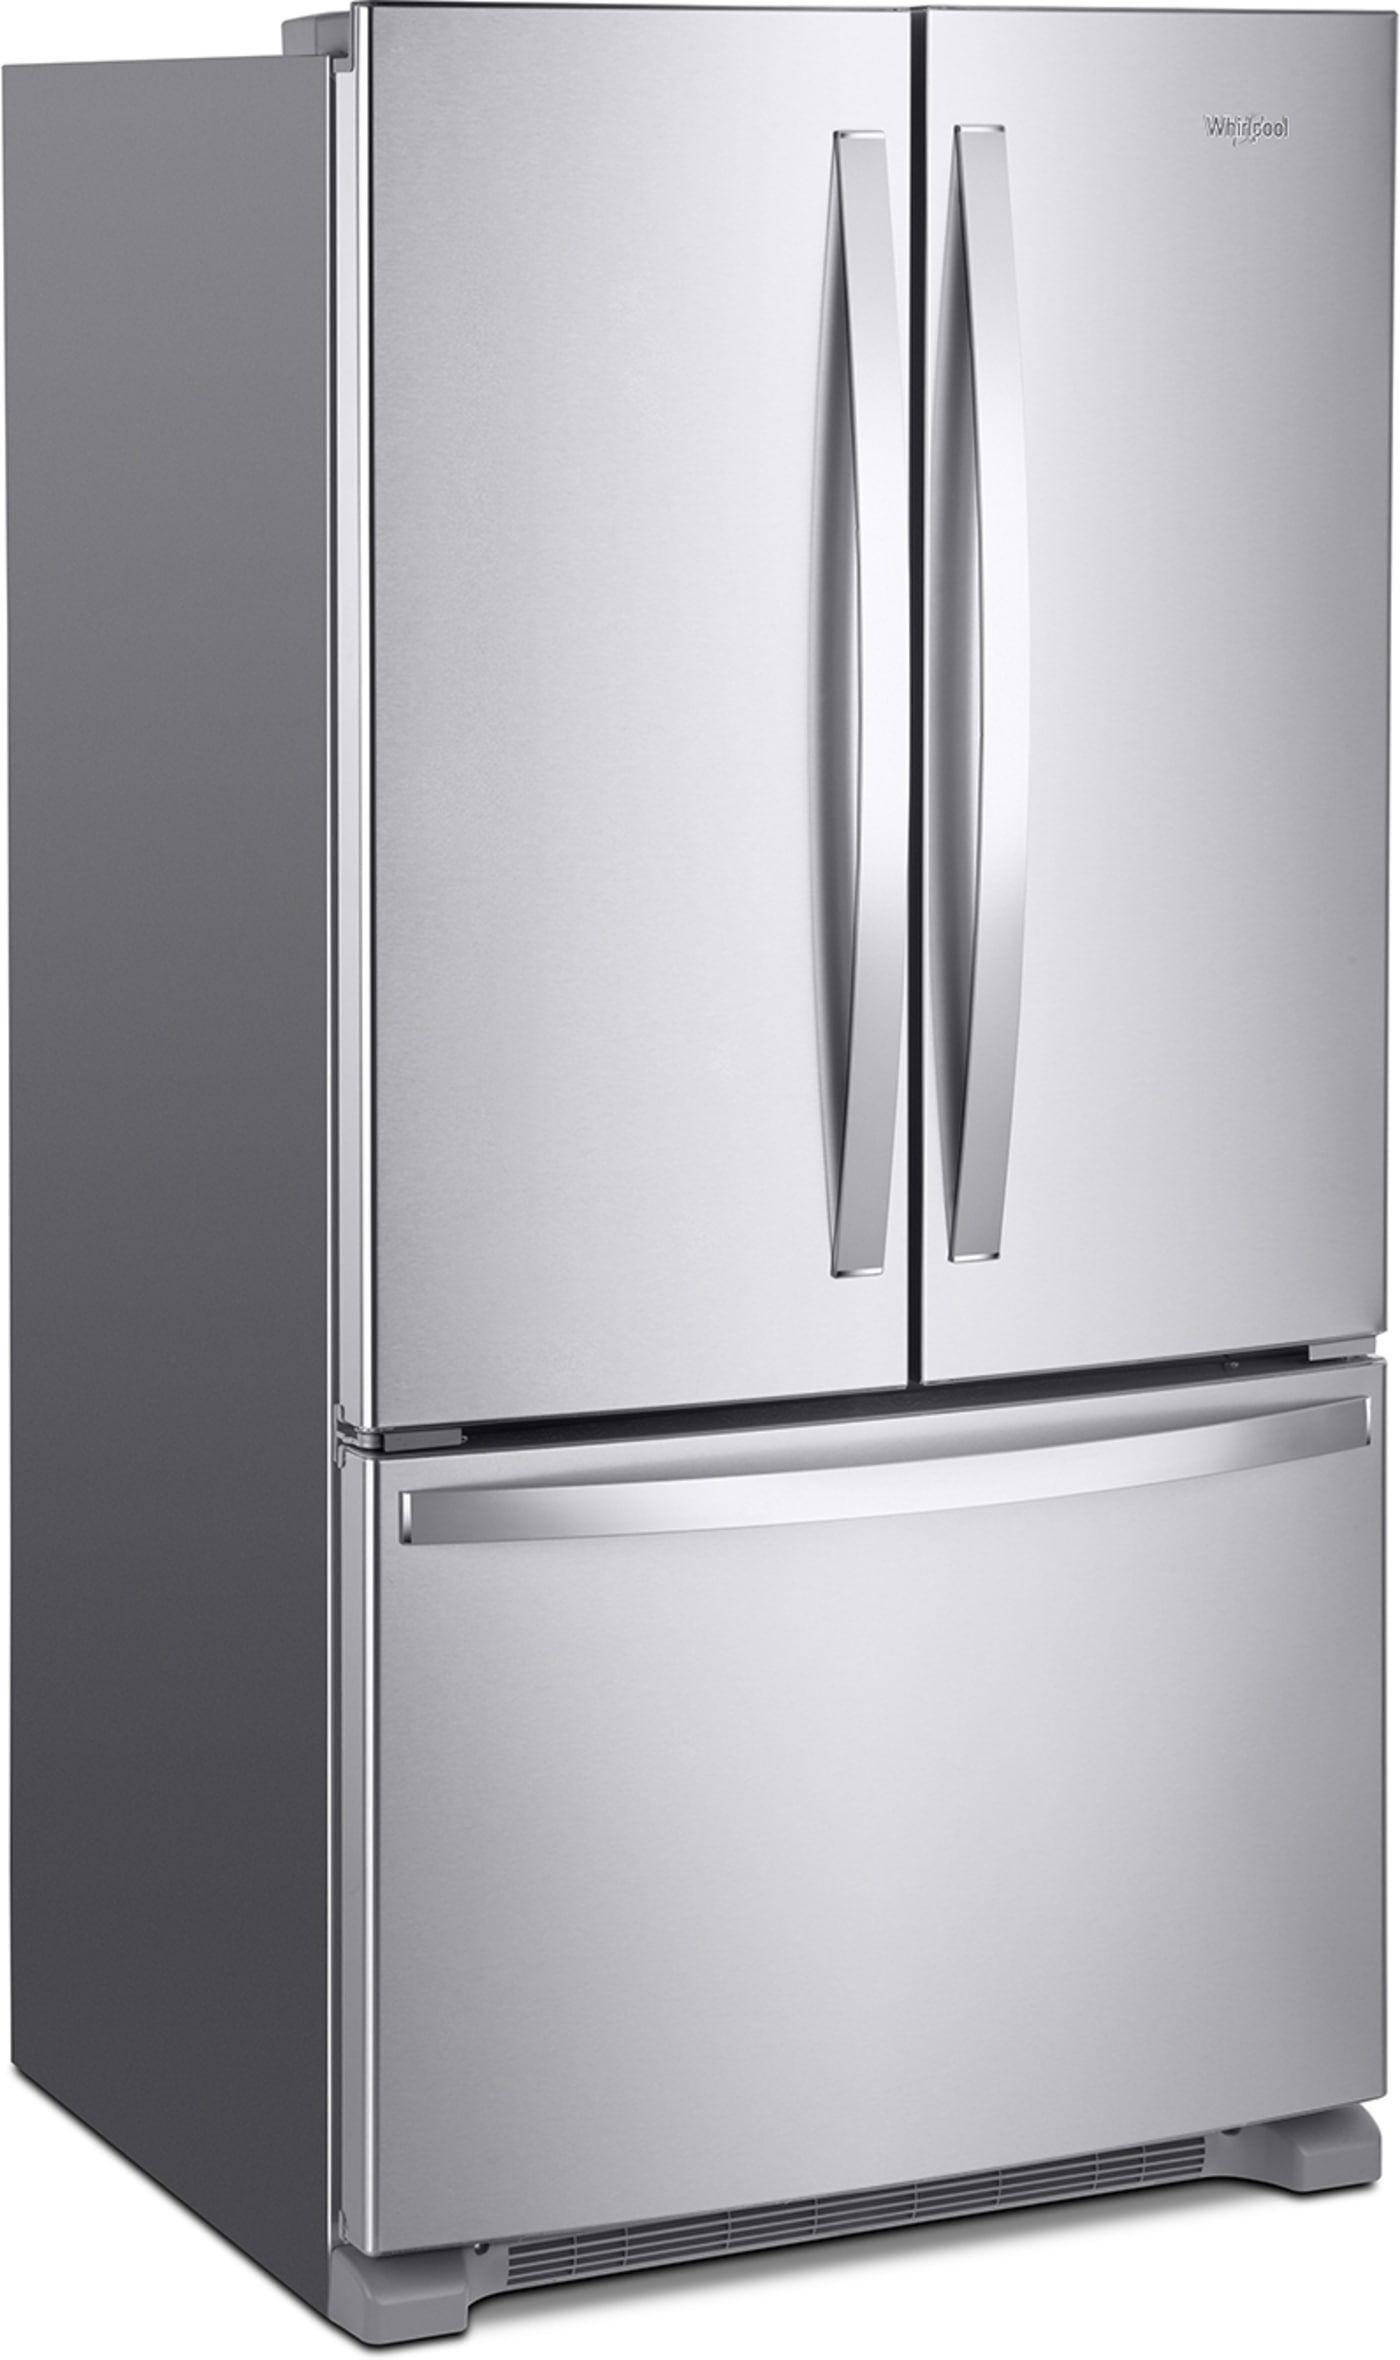 Wrf535swhz By Whirlpool French Door Refrigerators Goedekers